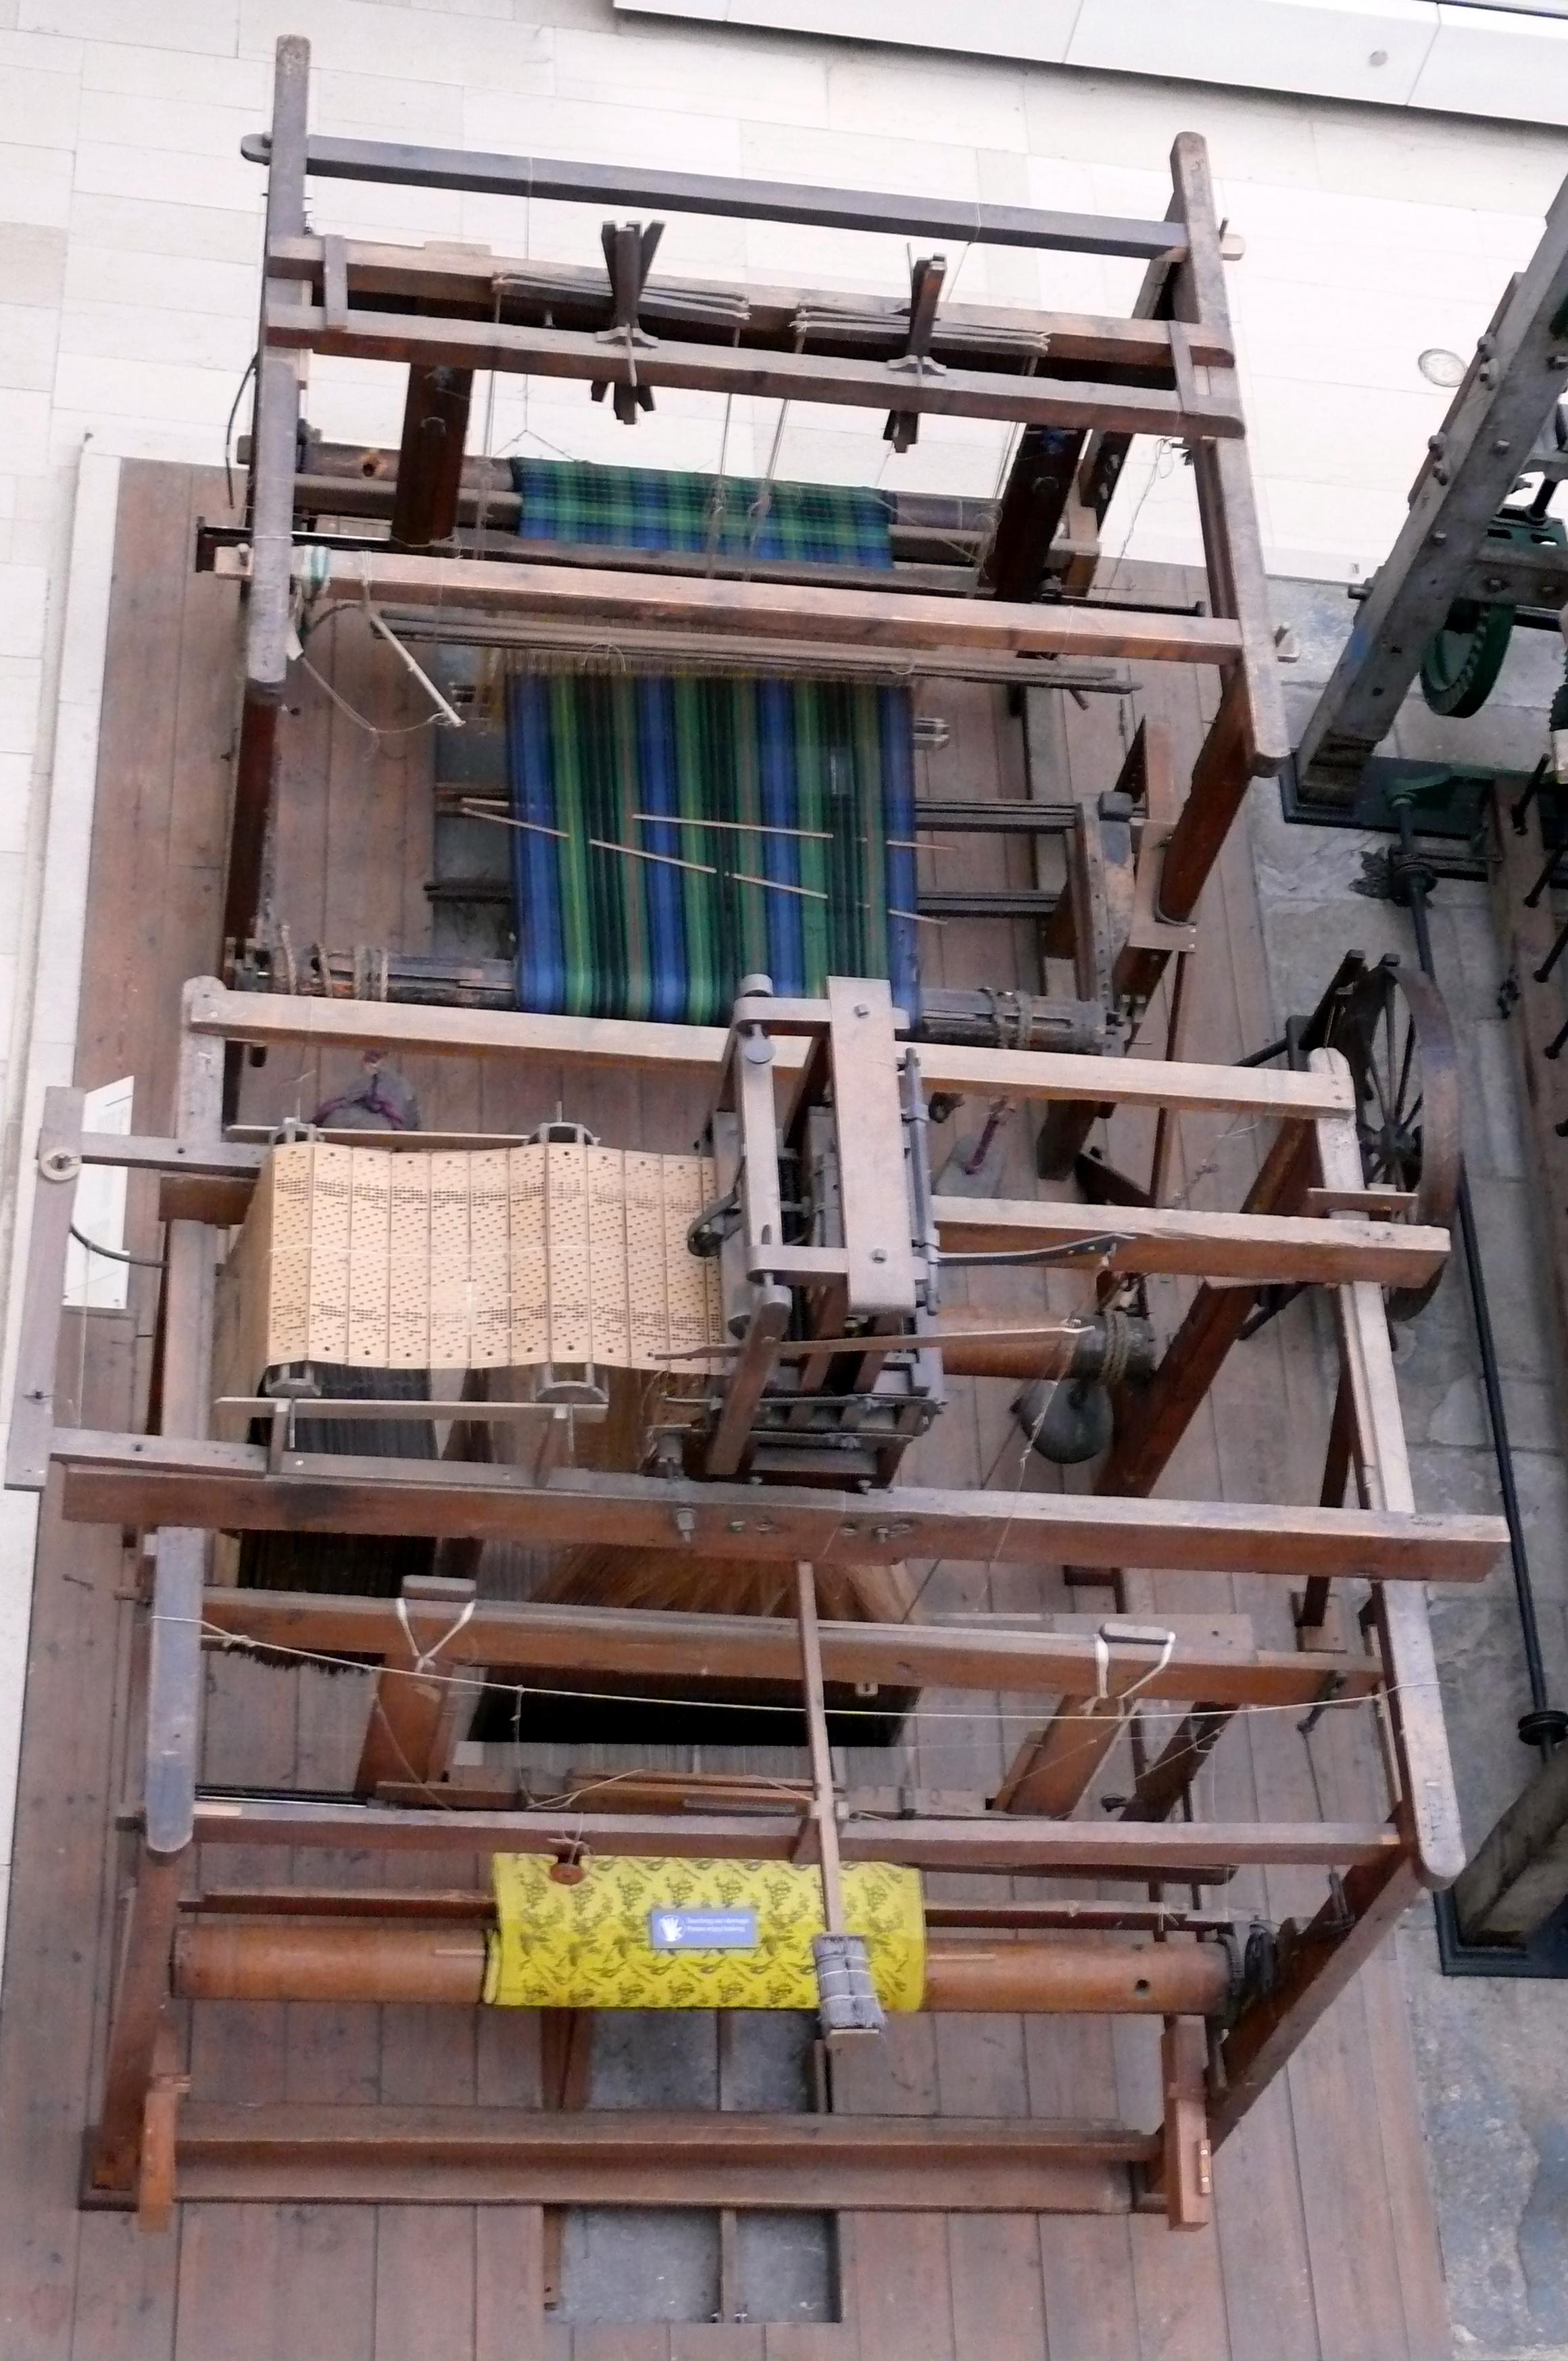 File:NMS Tartan and Jacquard loom.JPG - Wikimedia Commons